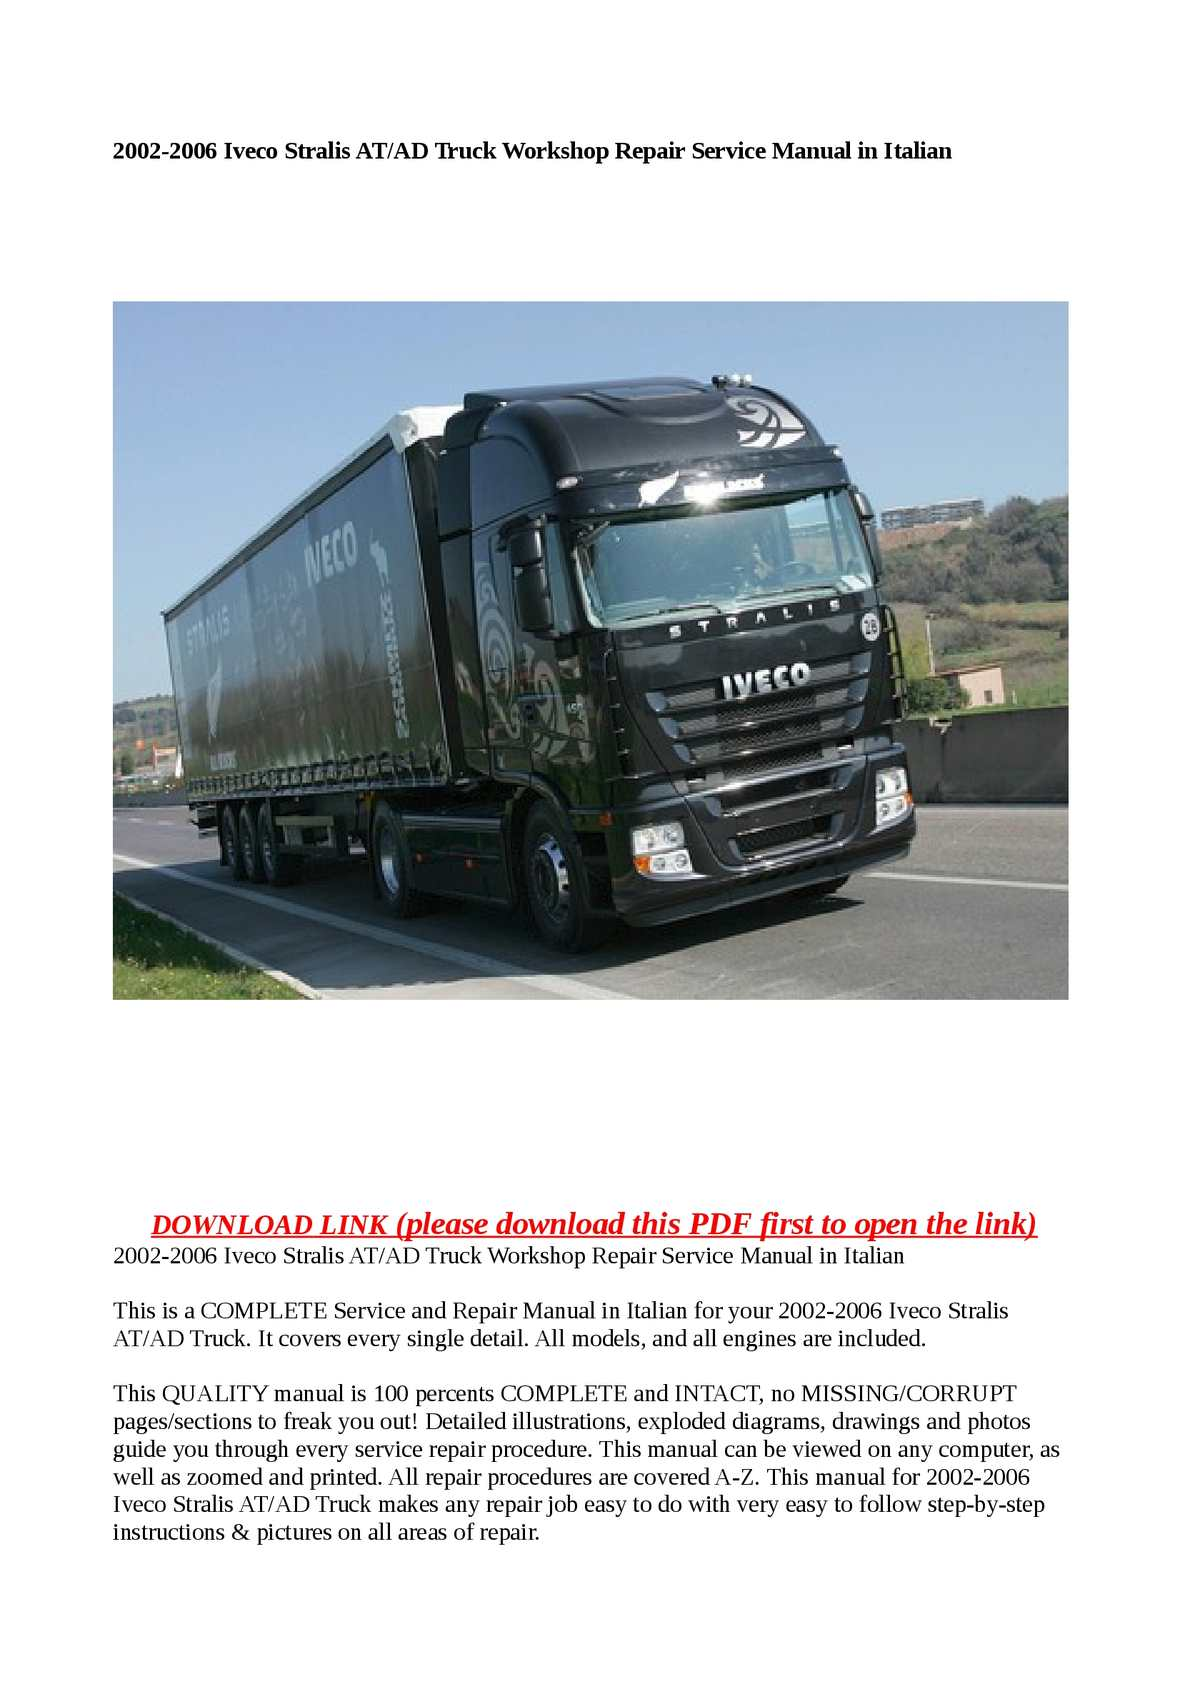 Calaméo - 2002-2006 Iveco Stralis AT/AD Truck Workshop Repair Service Manual  in Italian